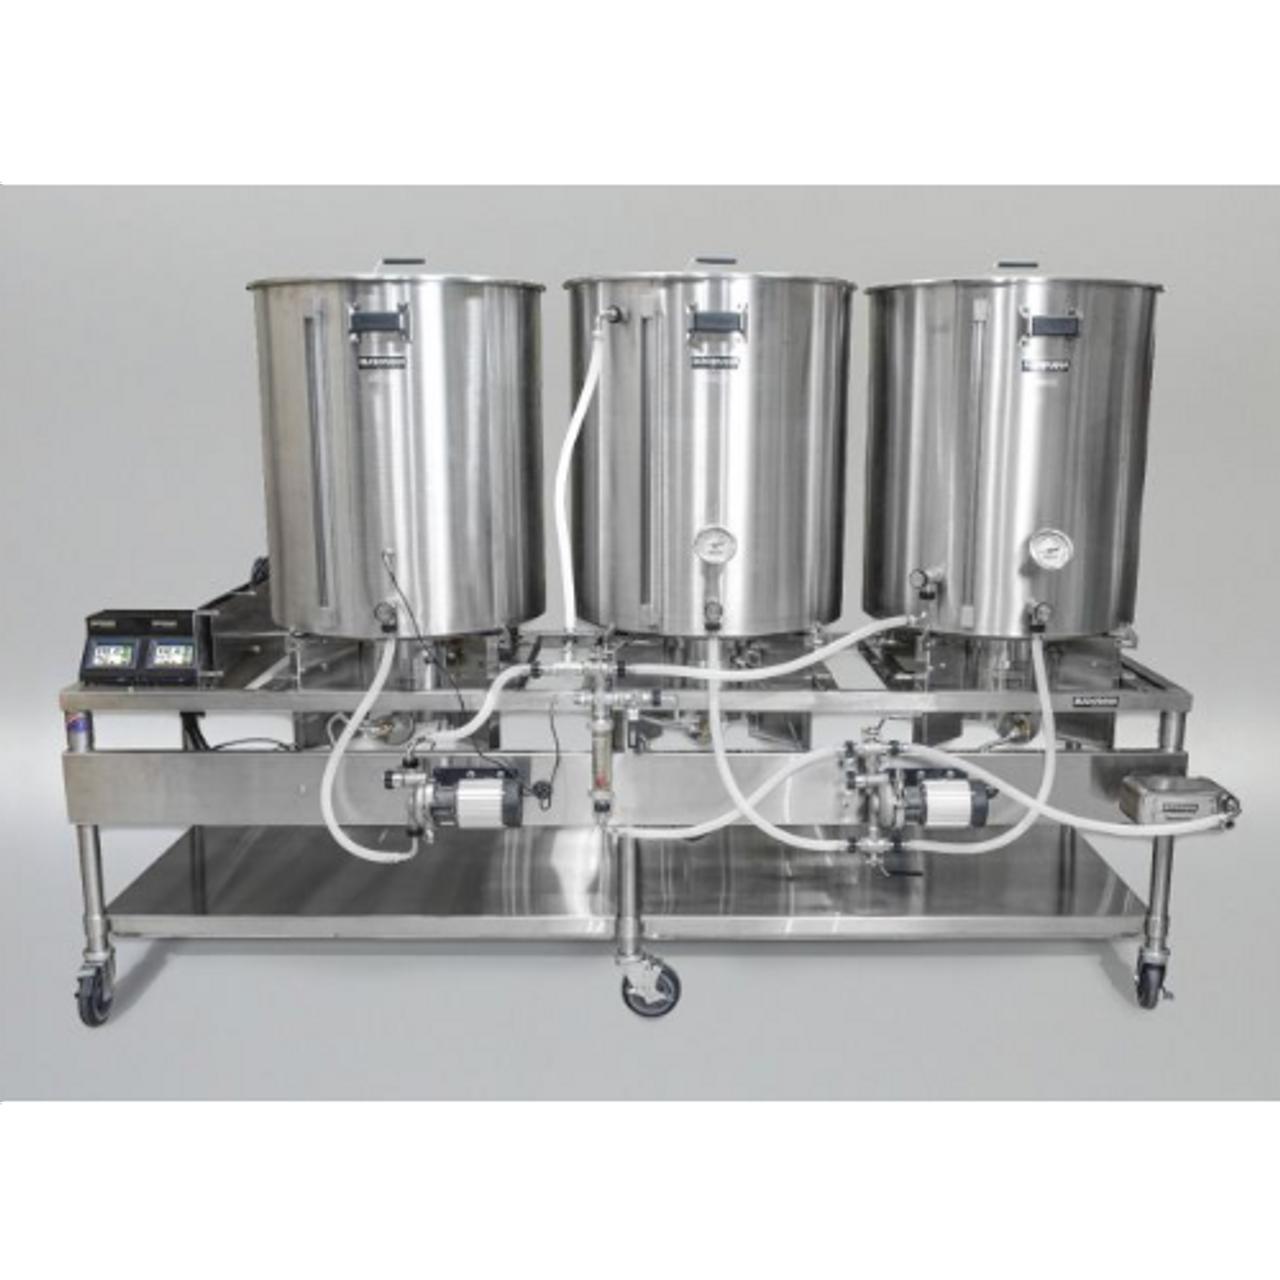 Blichmann Horizontal Brew Systems